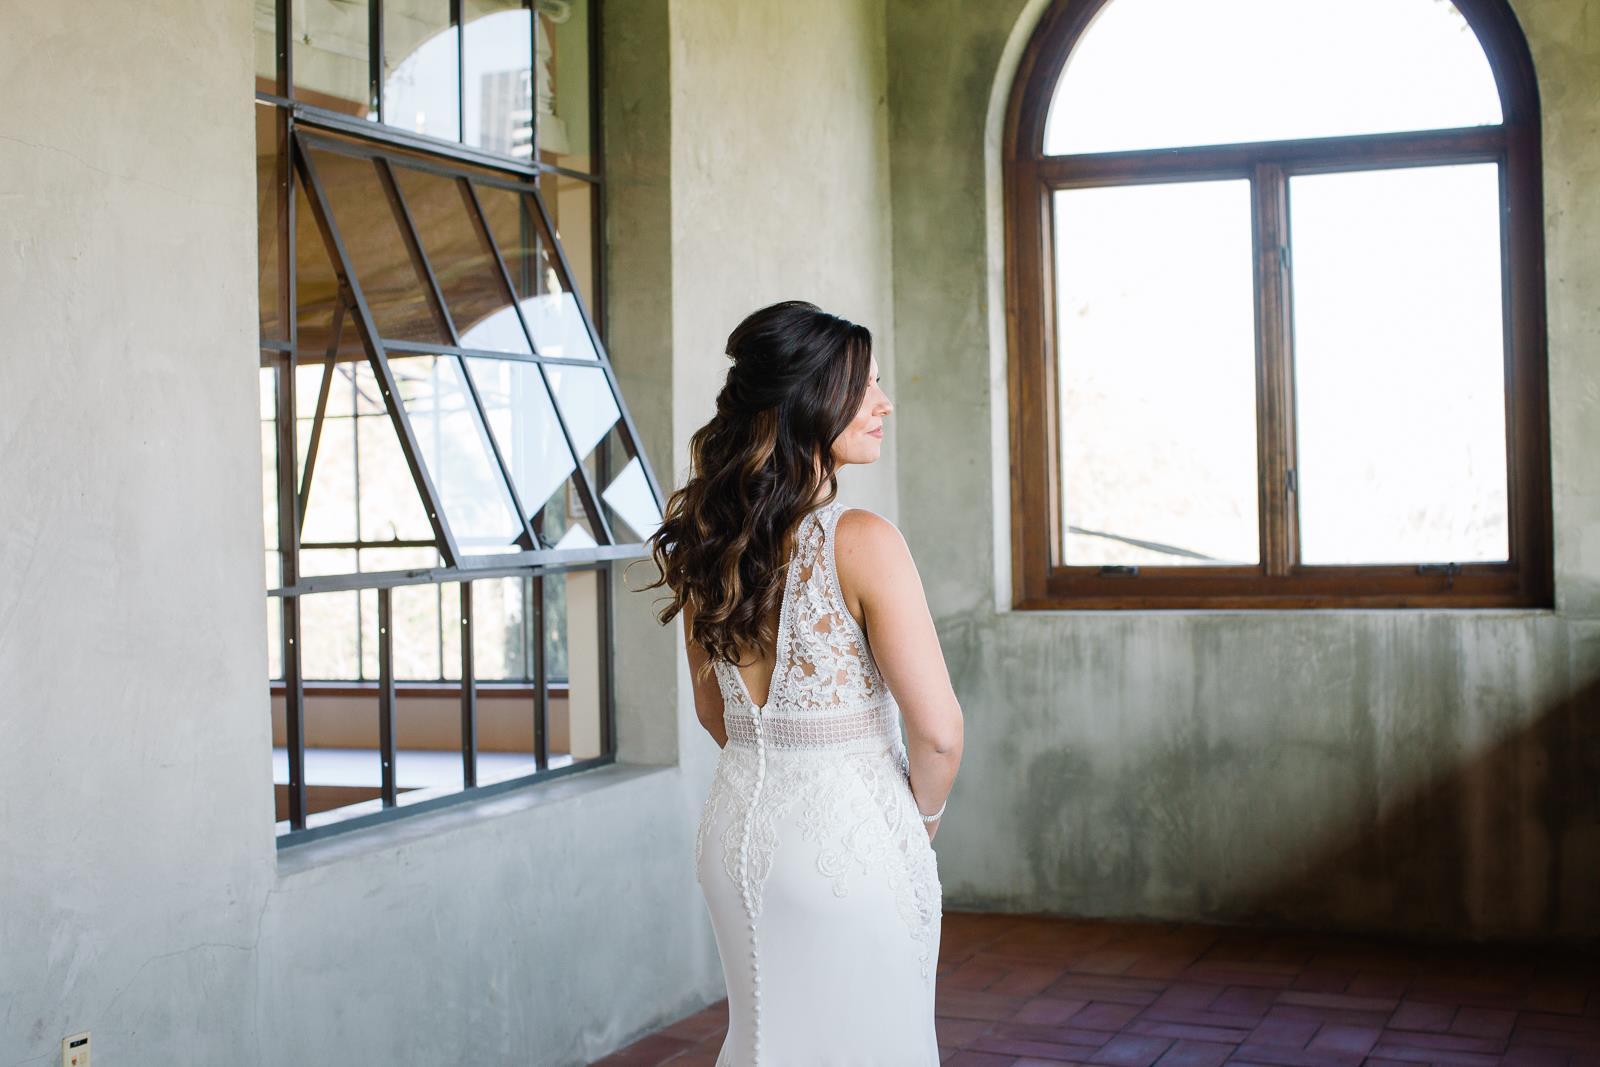 summerour-studio-wedding-atlanta